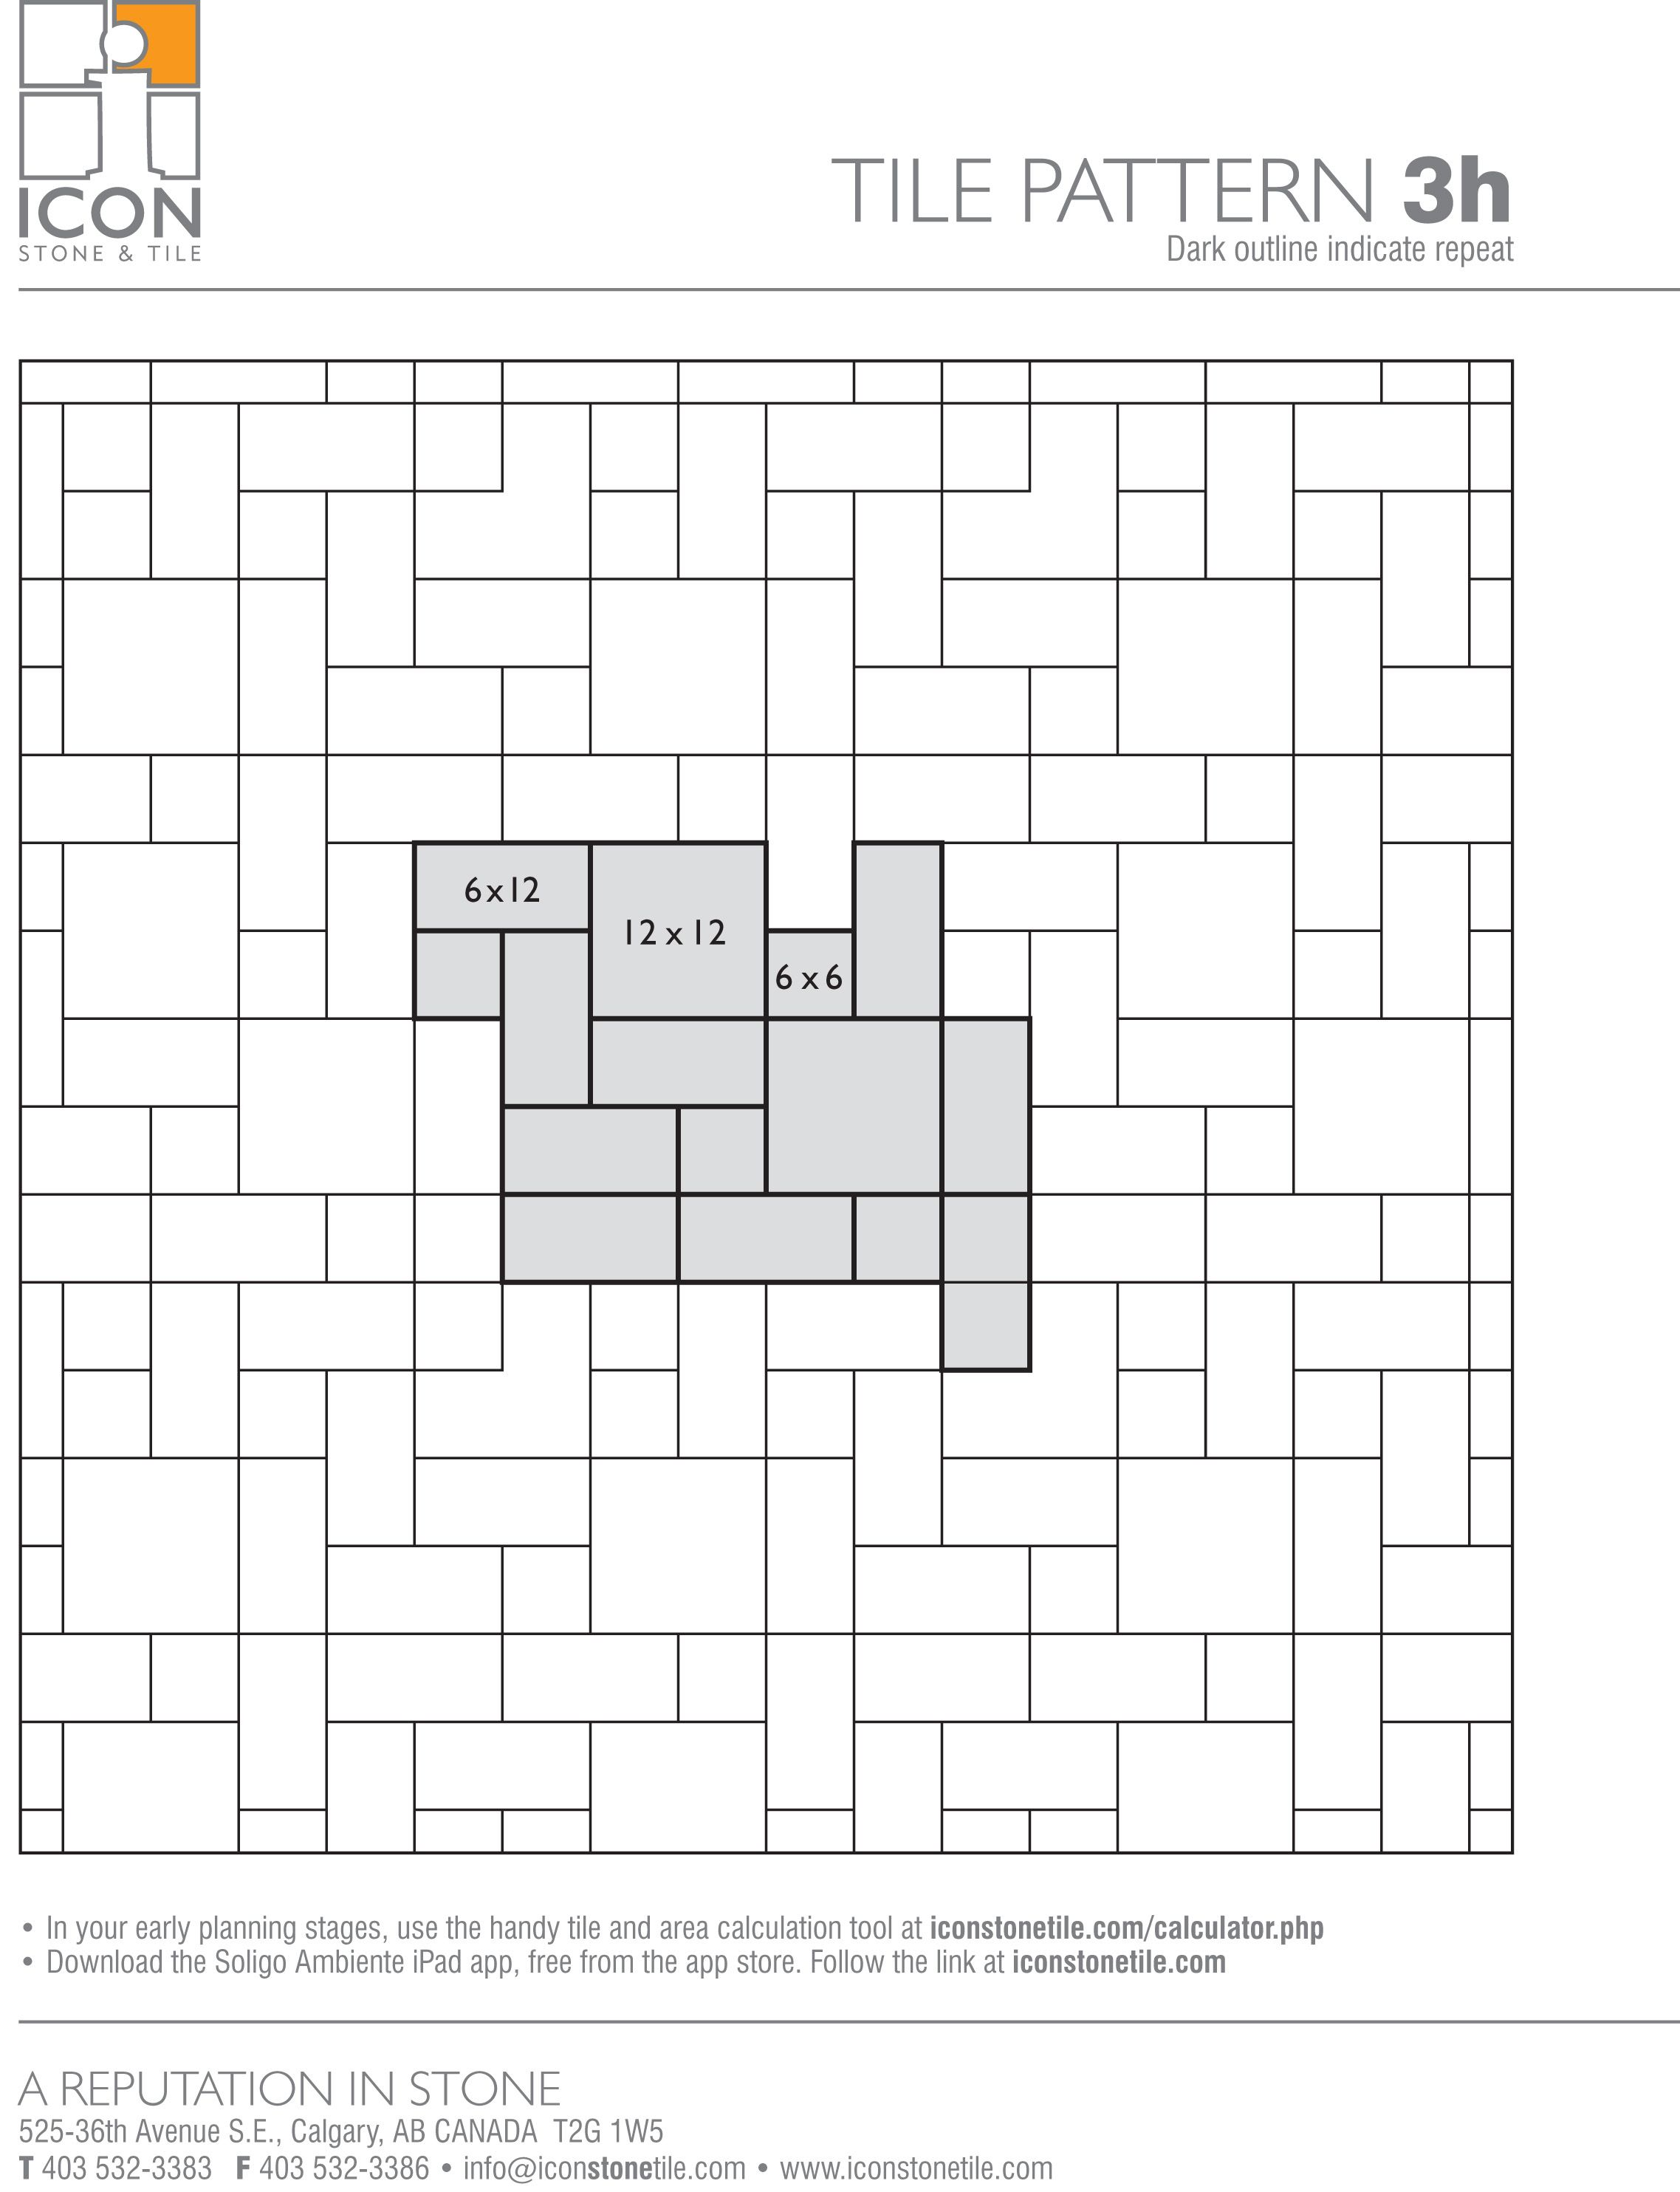 Best Quality Granite Marble Or Quartz Countertops And Tiles In Calgary Tile Patterns Home Tiles Design Patterned Floor Tiles